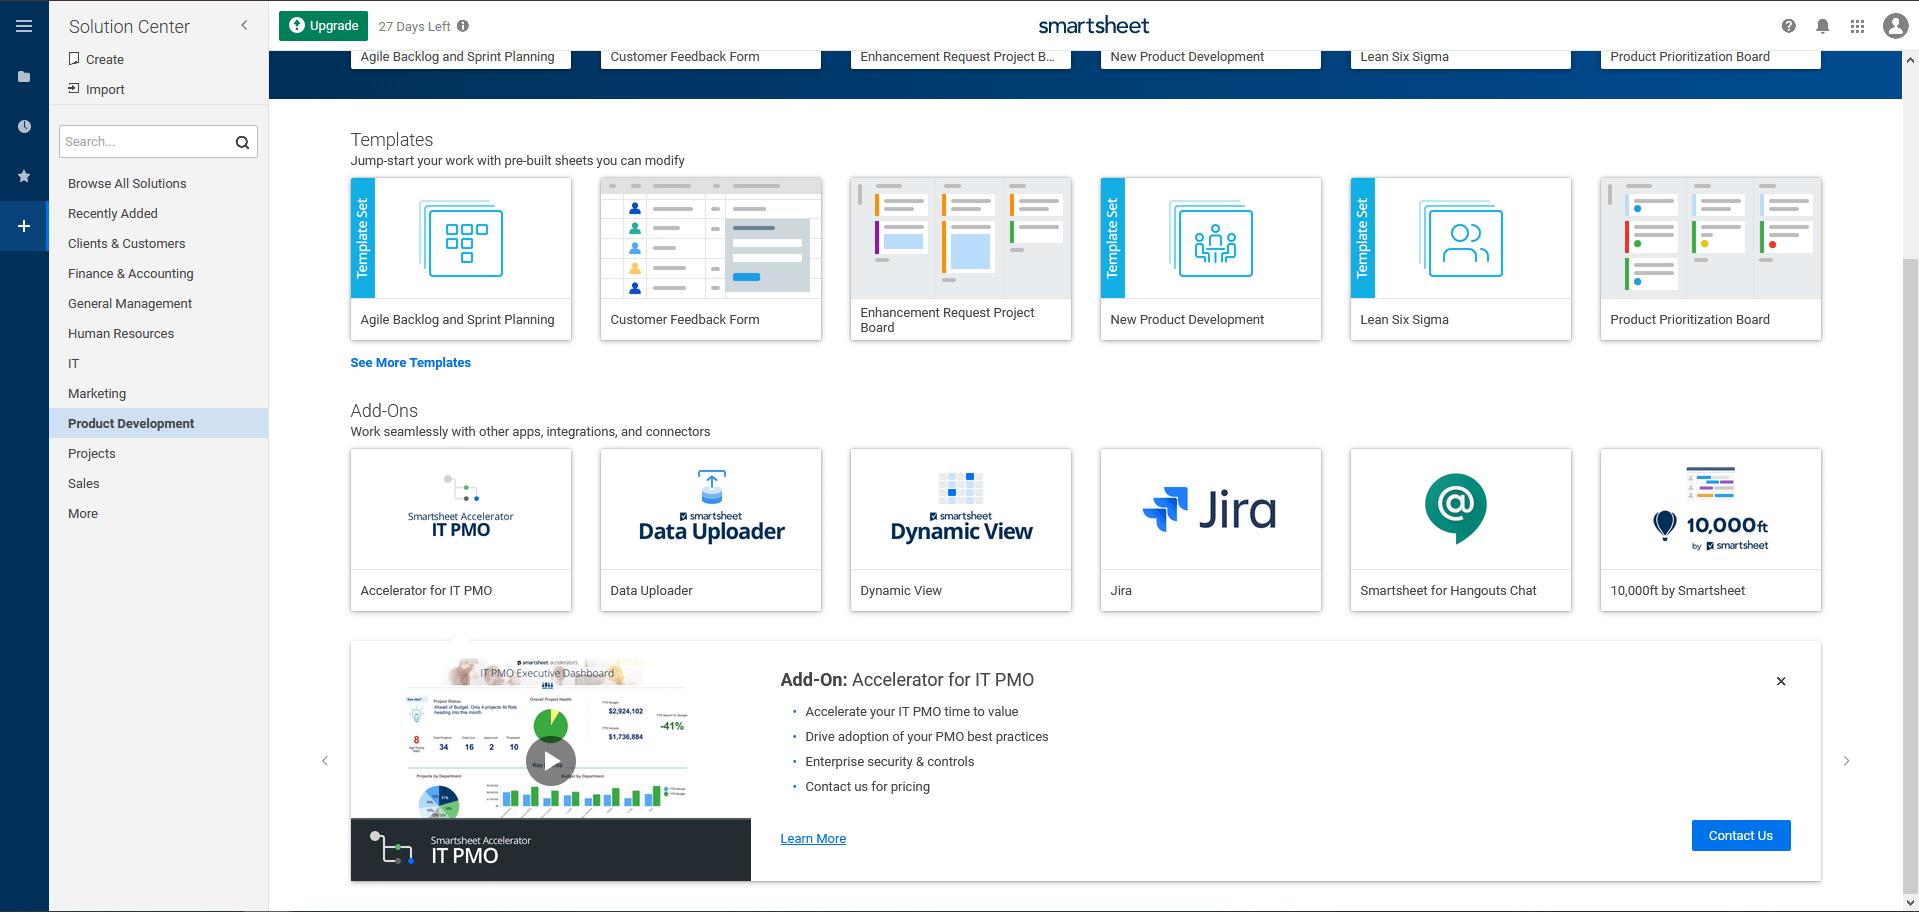 business process templates in Smartsheet